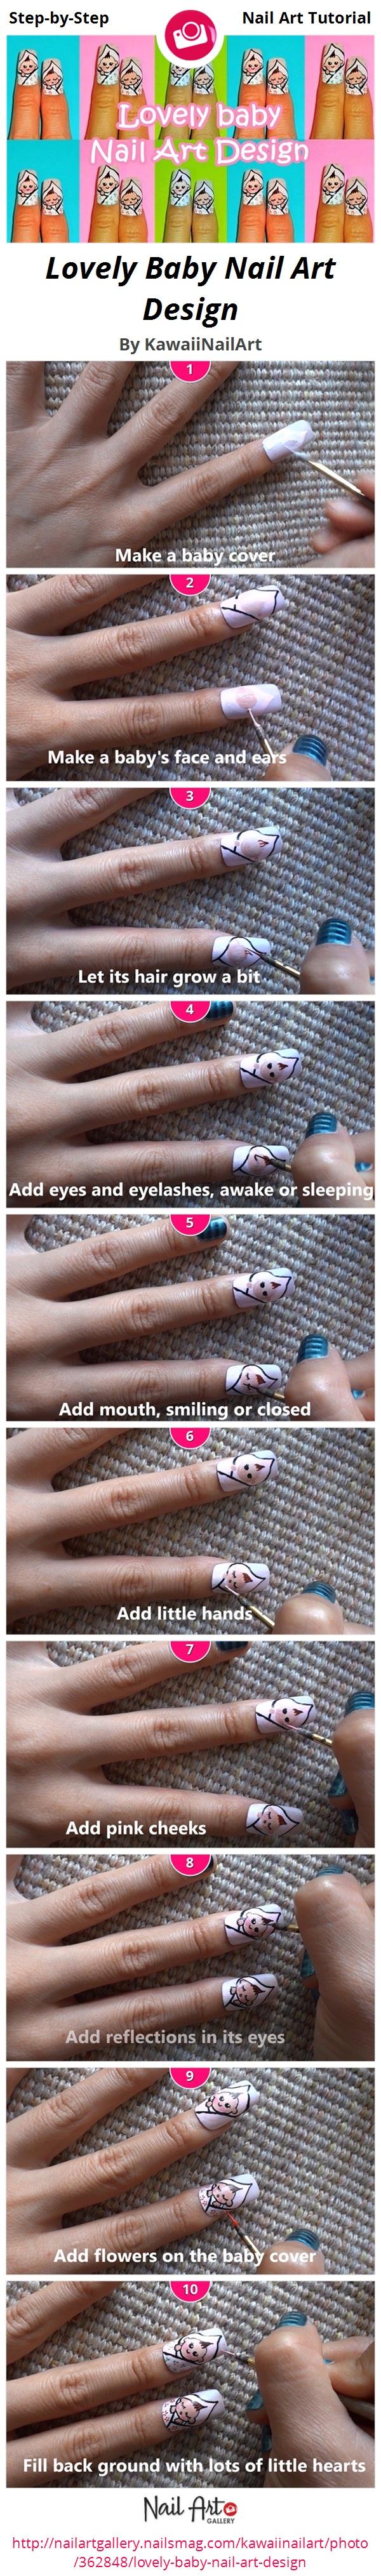 Lovely Baby Nail Art Design - Nail Art Gallery